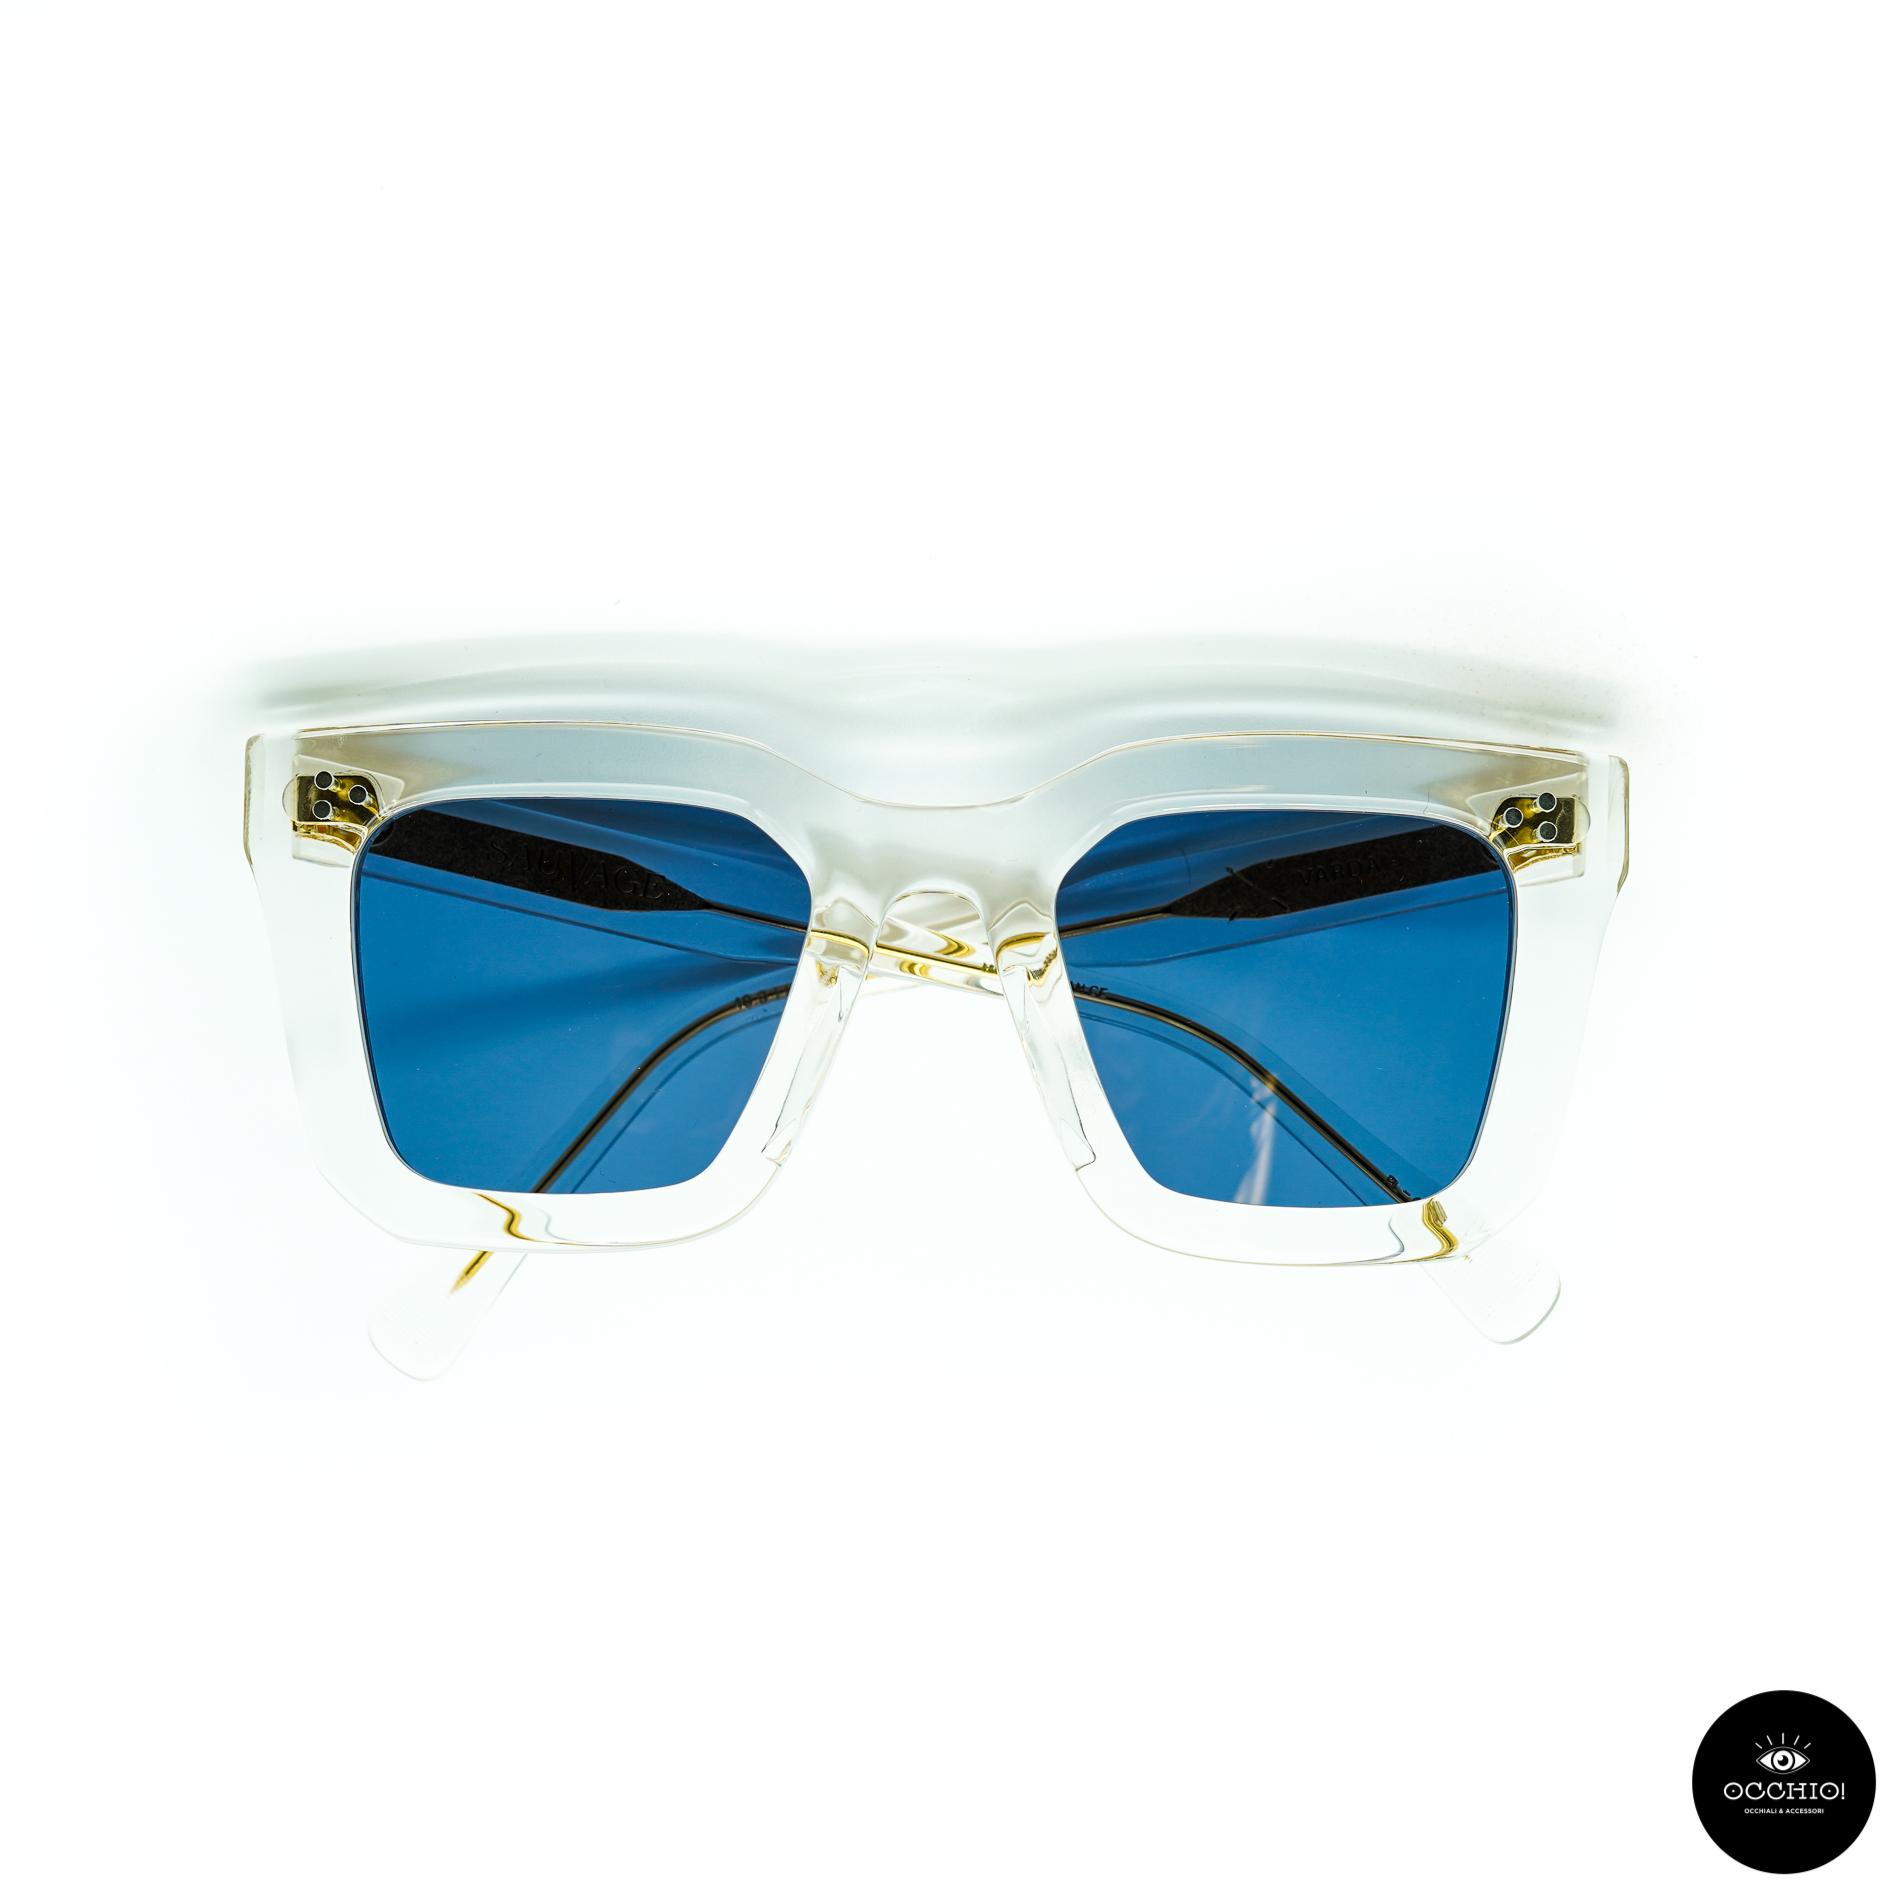 SAUVAGE, Varda Clear crystal / Solid Blue